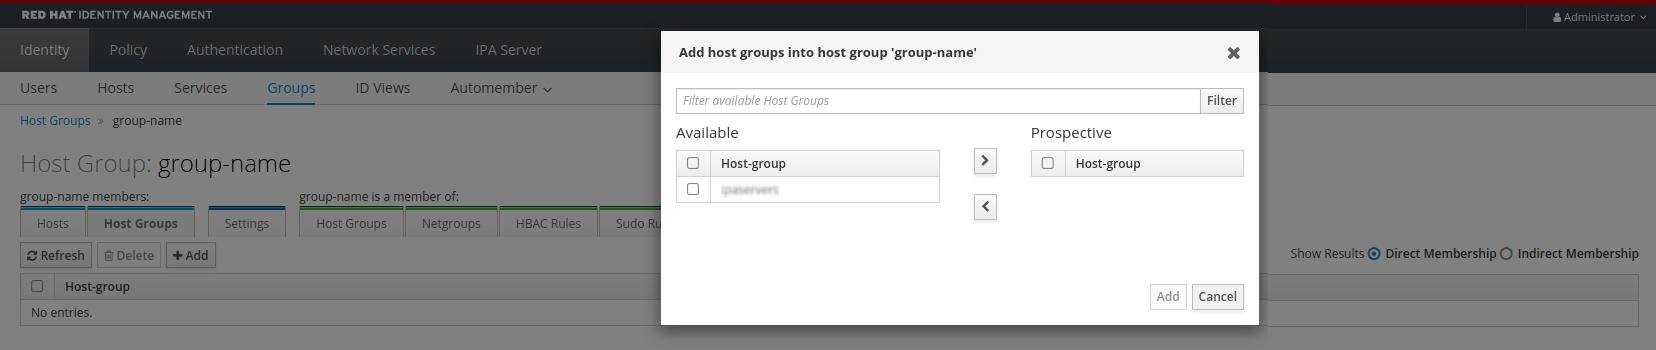 idm adding host group members